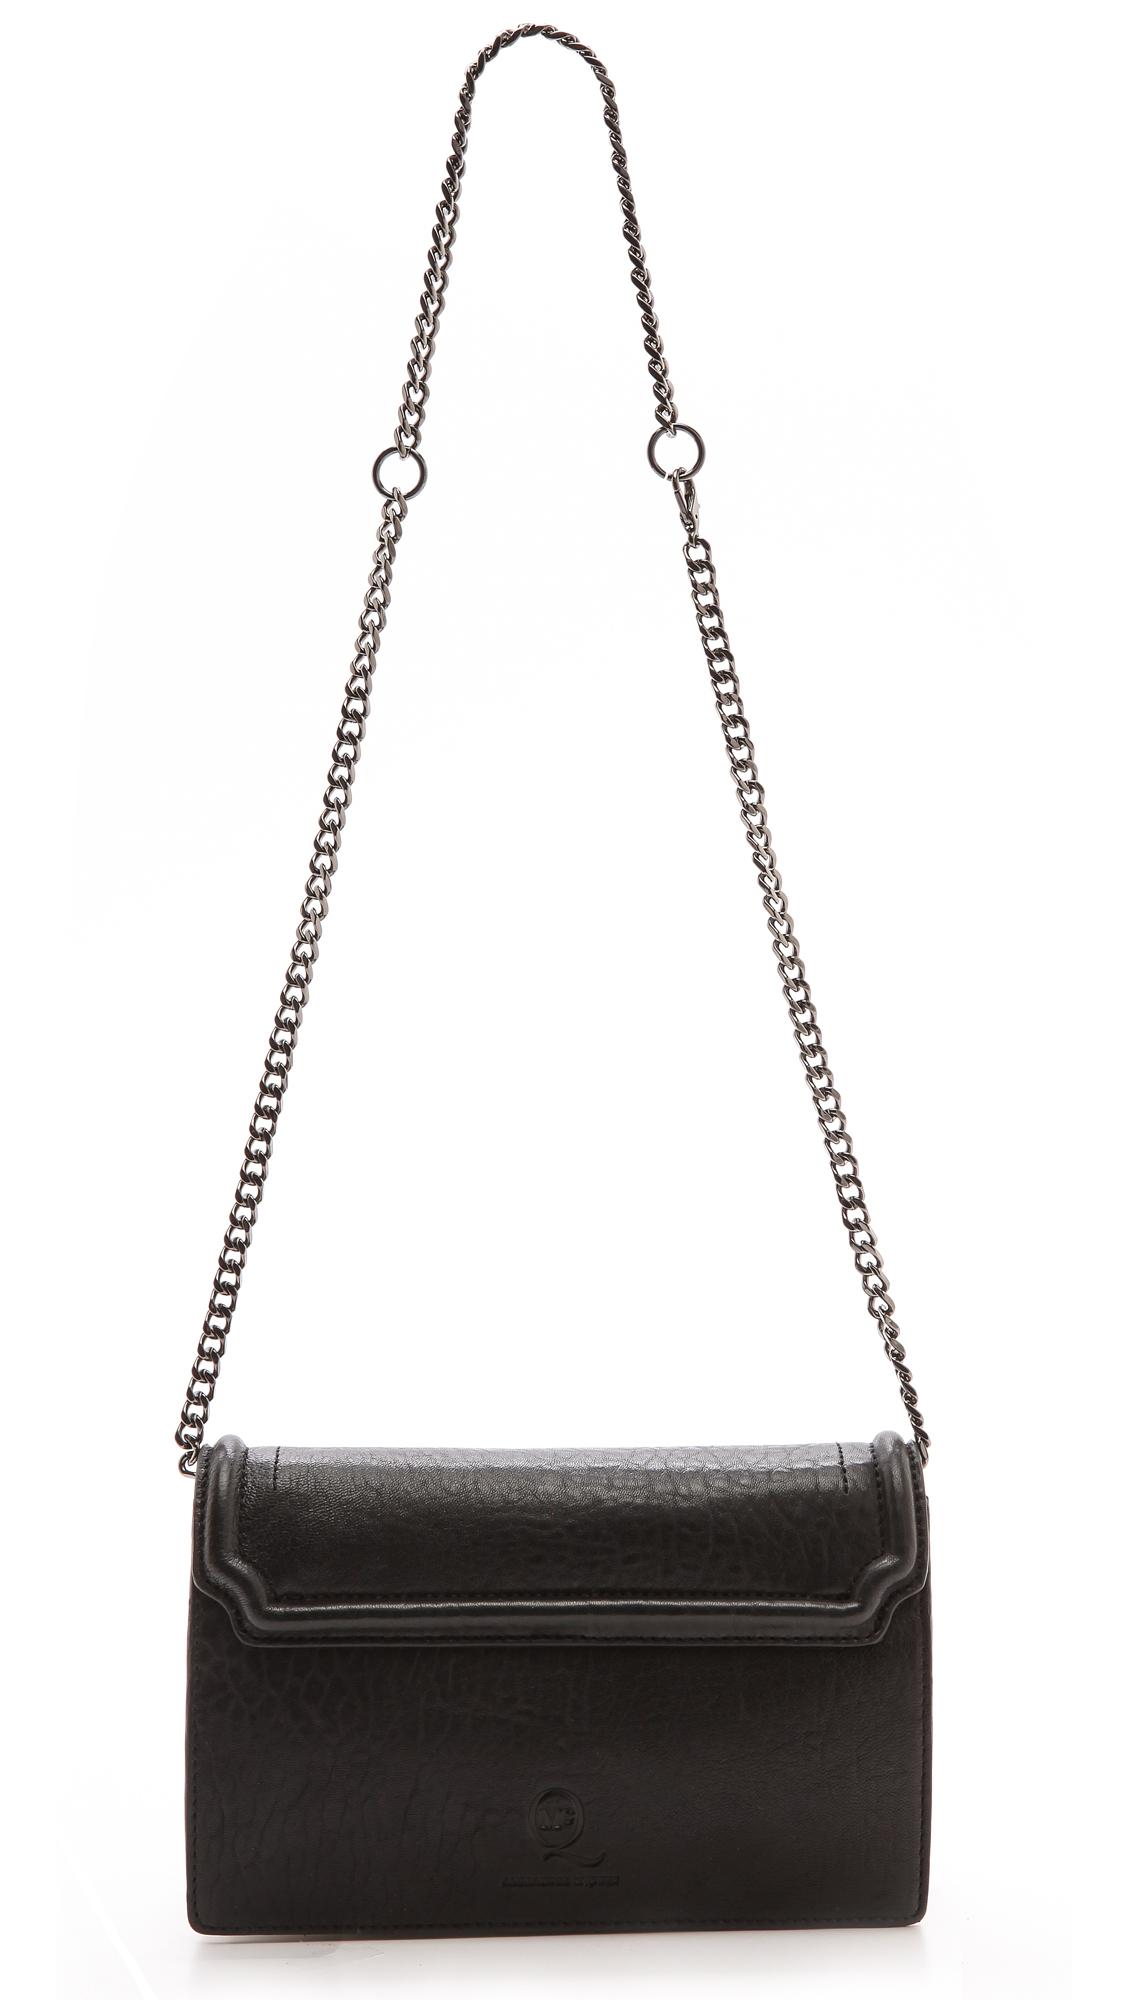 497ec73a7ac8 McQ - Alexander McQueen Simple Fold Bag